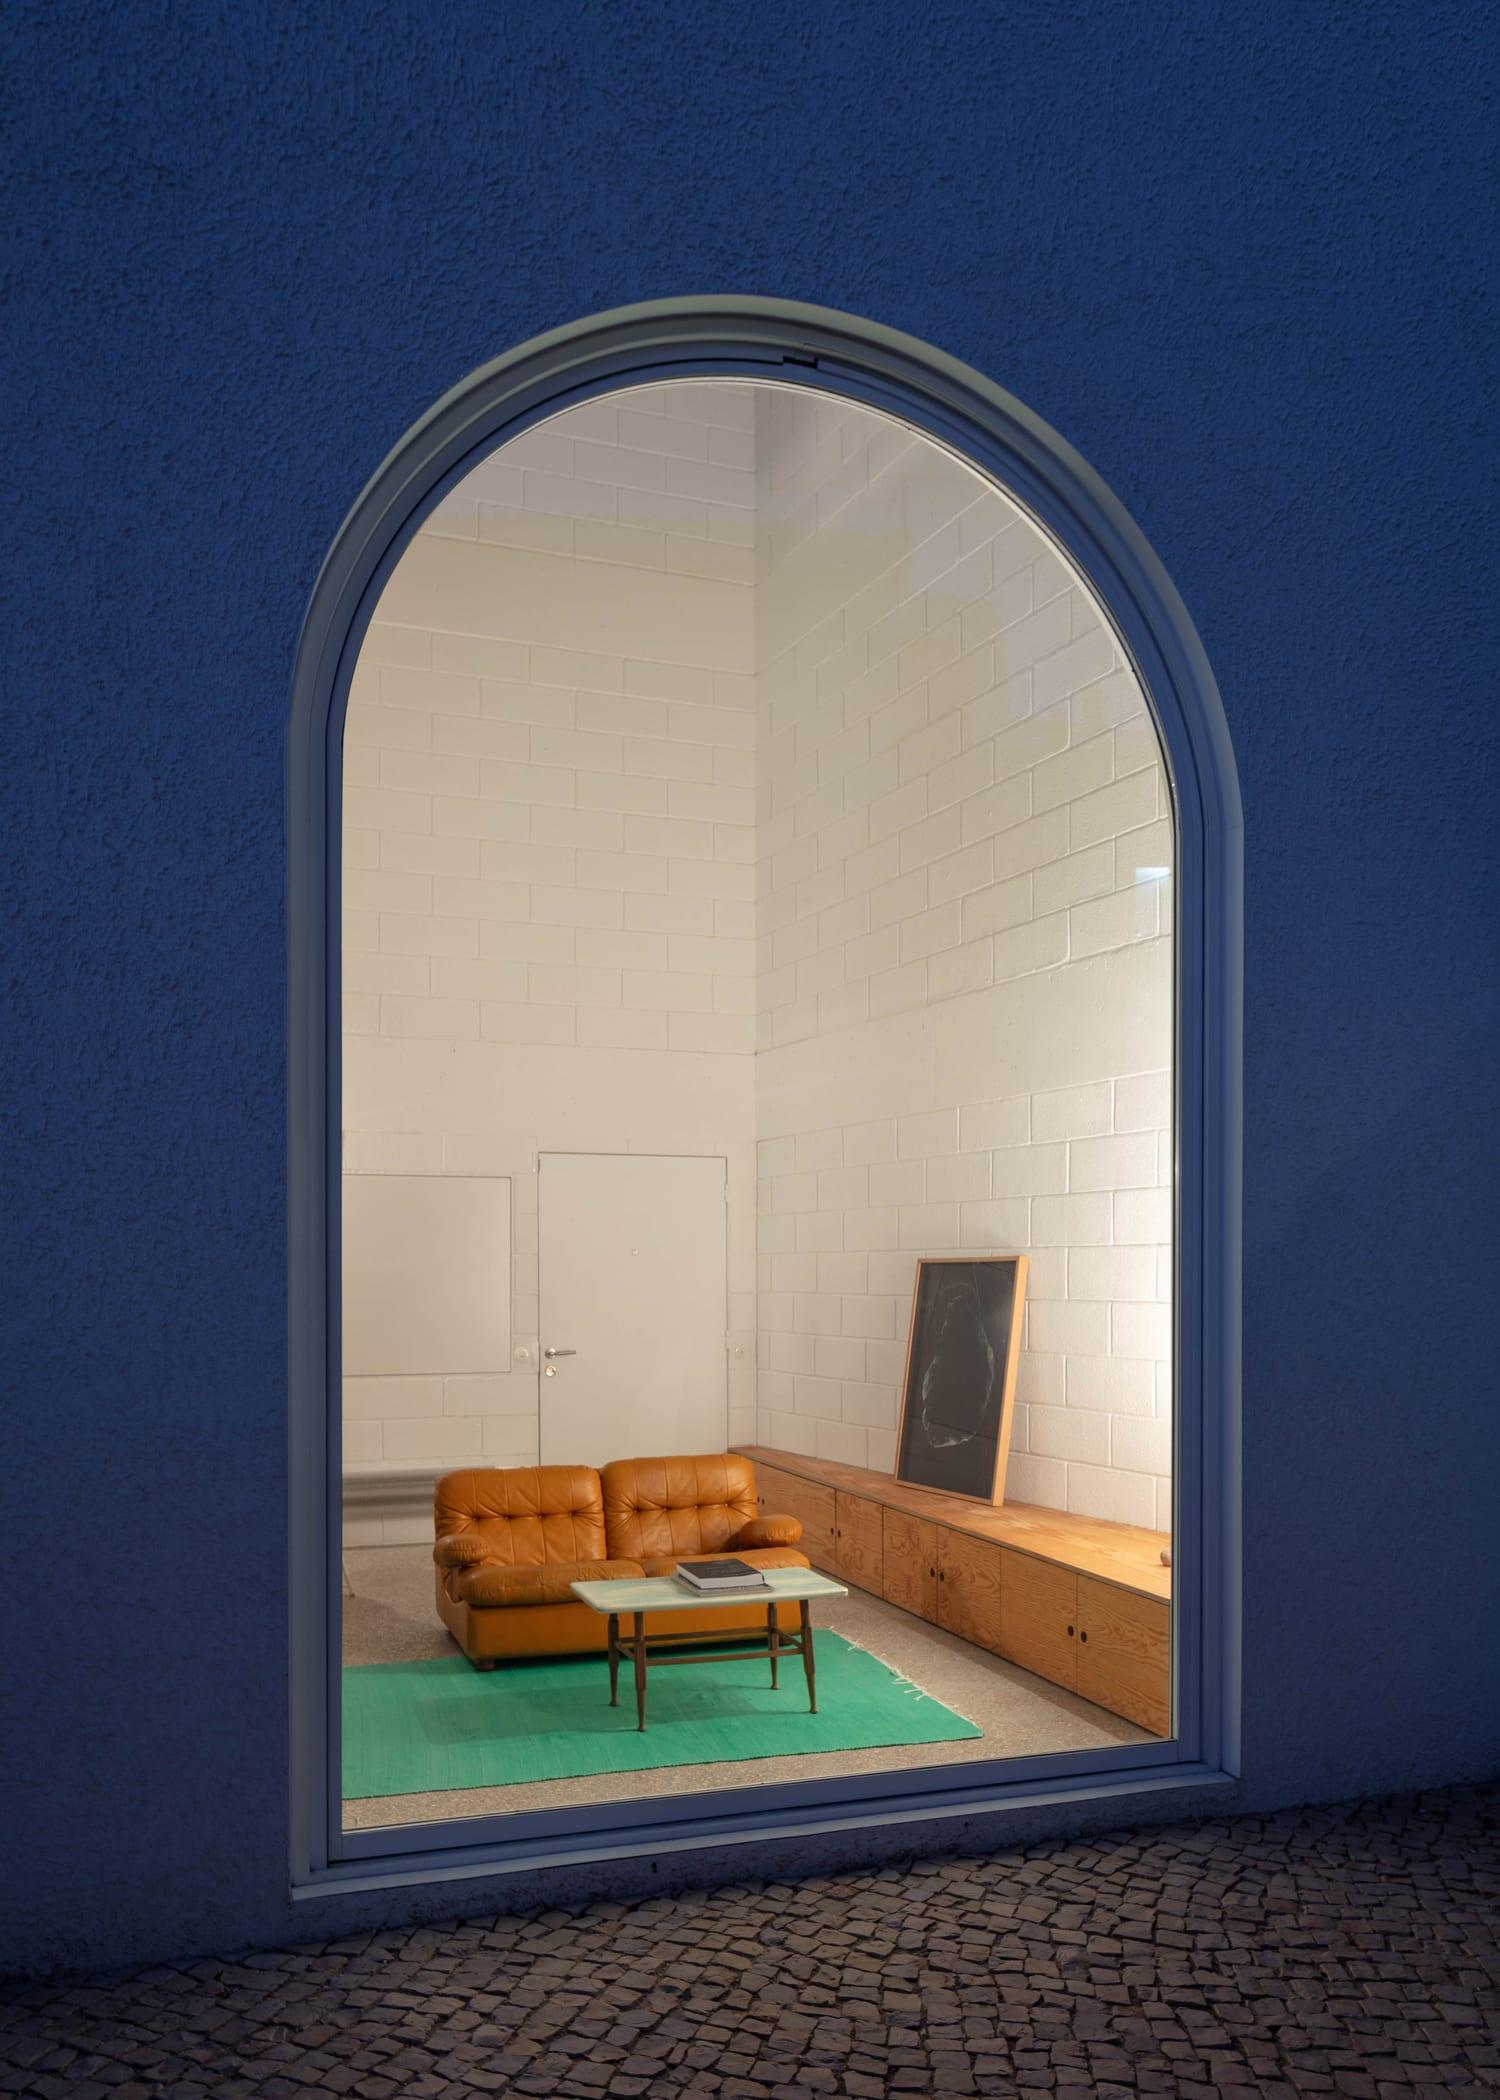 Dodged House In Lisbon By Leopold Banchini Daniel Zamarbide Yellowtrace 26